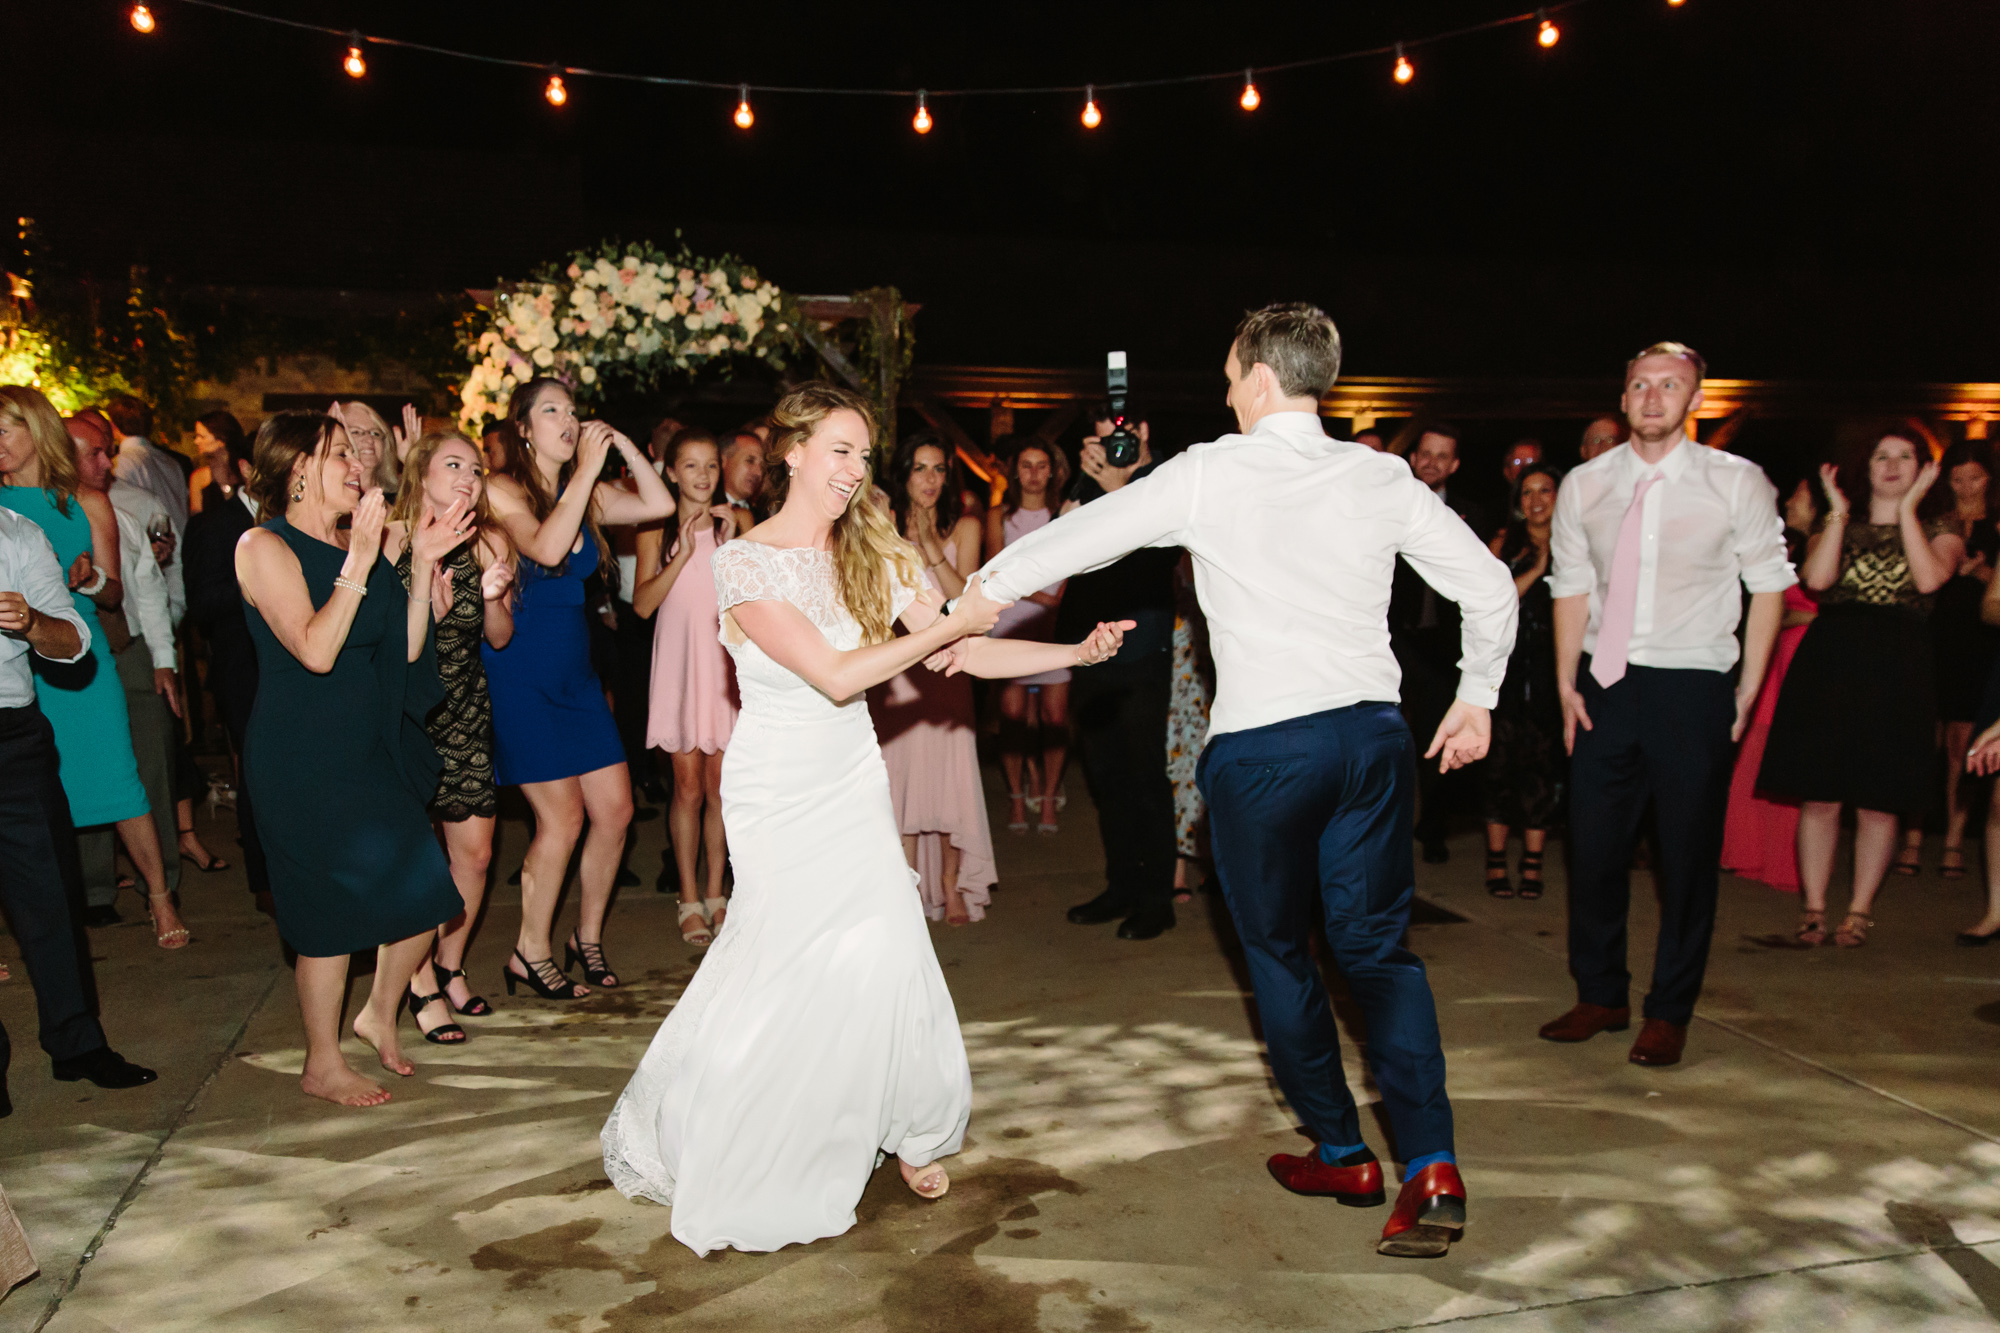 73_Jessica_Ted_Blue_Hill_Stone_Barns_Wedding_Pocantico_NY_Tanya_Salazar_Photography_210.jpg